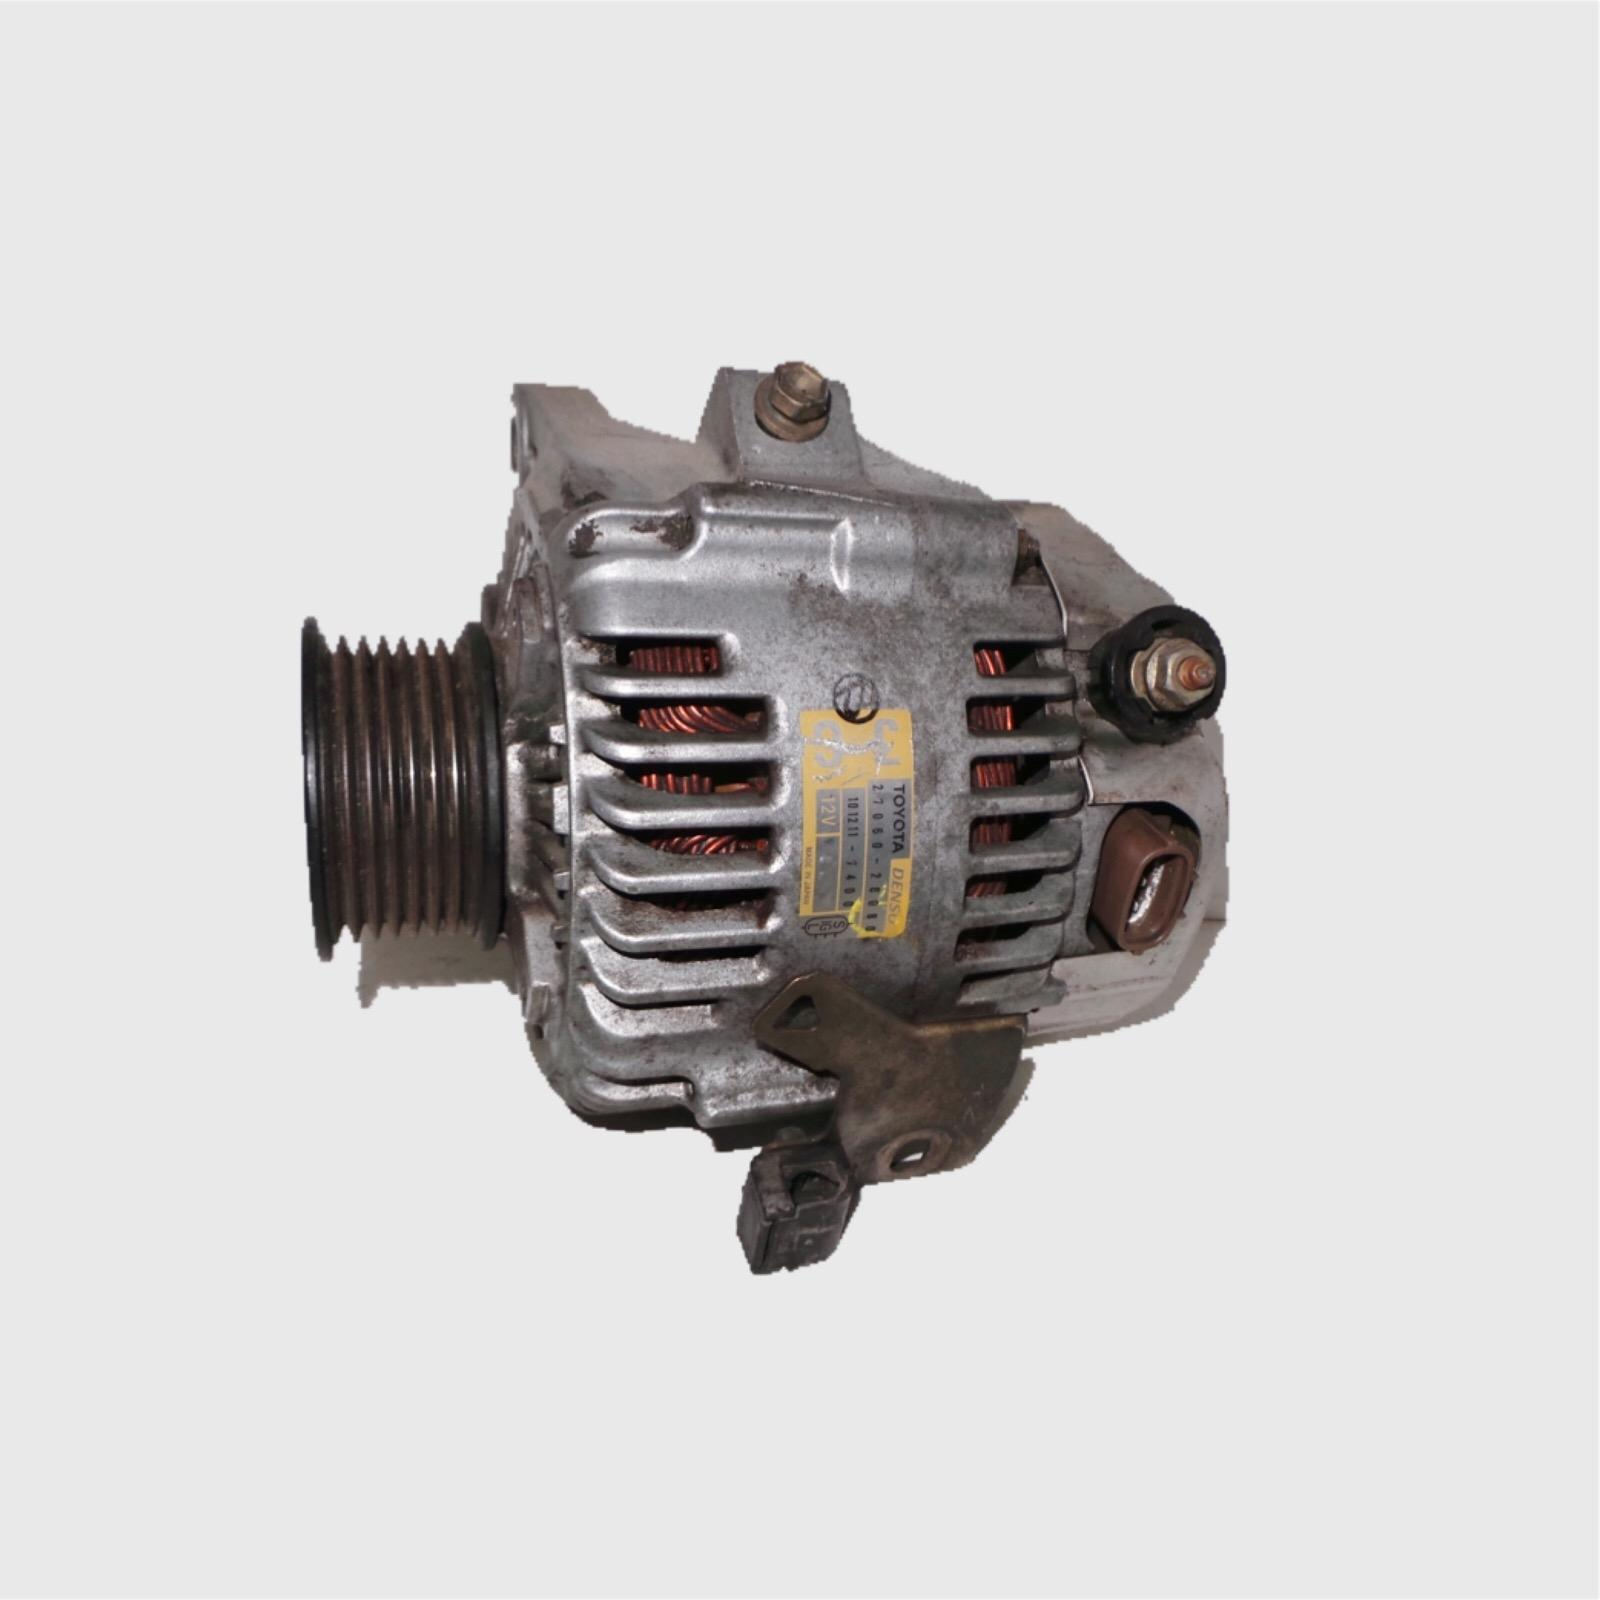 TOYOTA RAV4, Alternator, 2.0, 1AZ-FE, NIPPON DENSO P/N 27060-28080, ACA2#R, 07/00-09/03 (AUS ONLY)